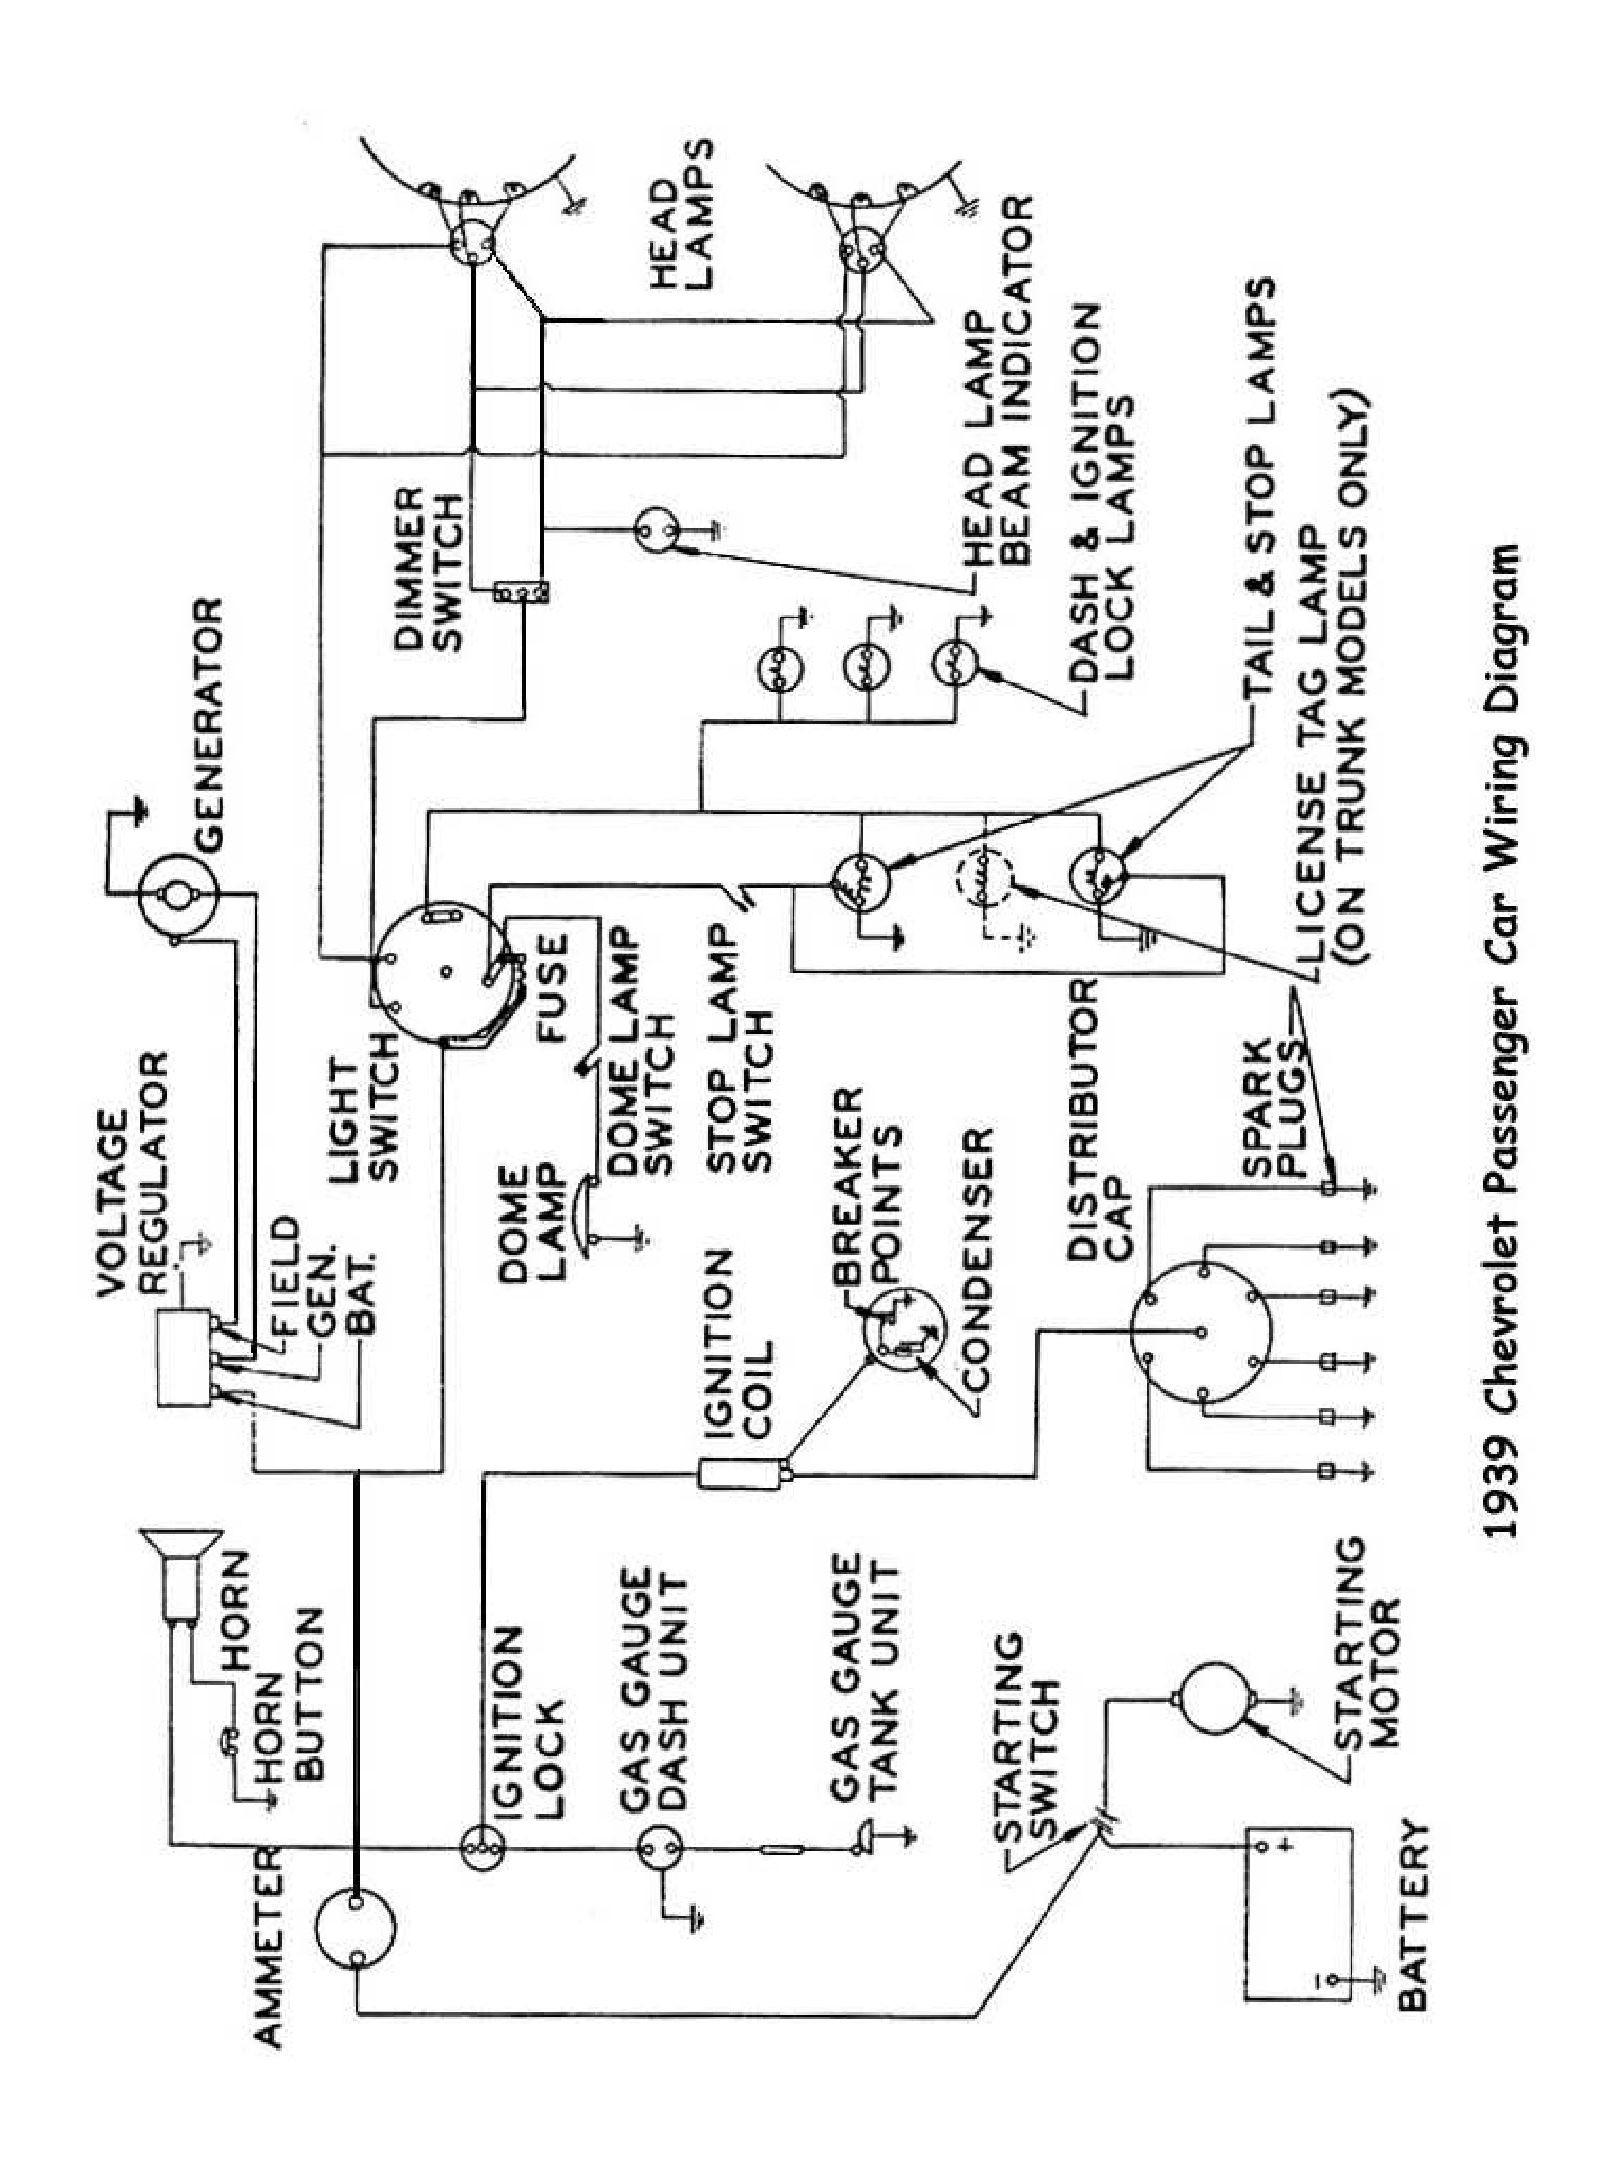 race car alternator wiring diagram rcd 65 chevy